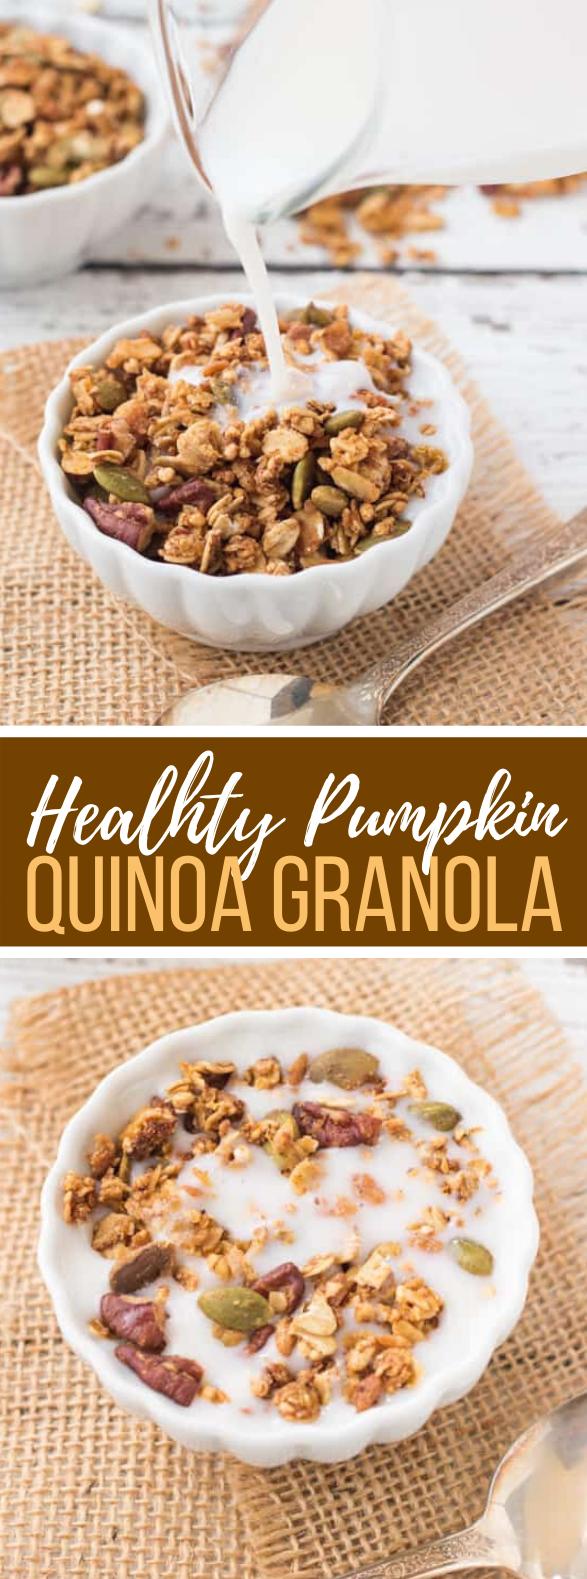 Healthy Pumpkin Quinoa Granola #breakfast #lowfat